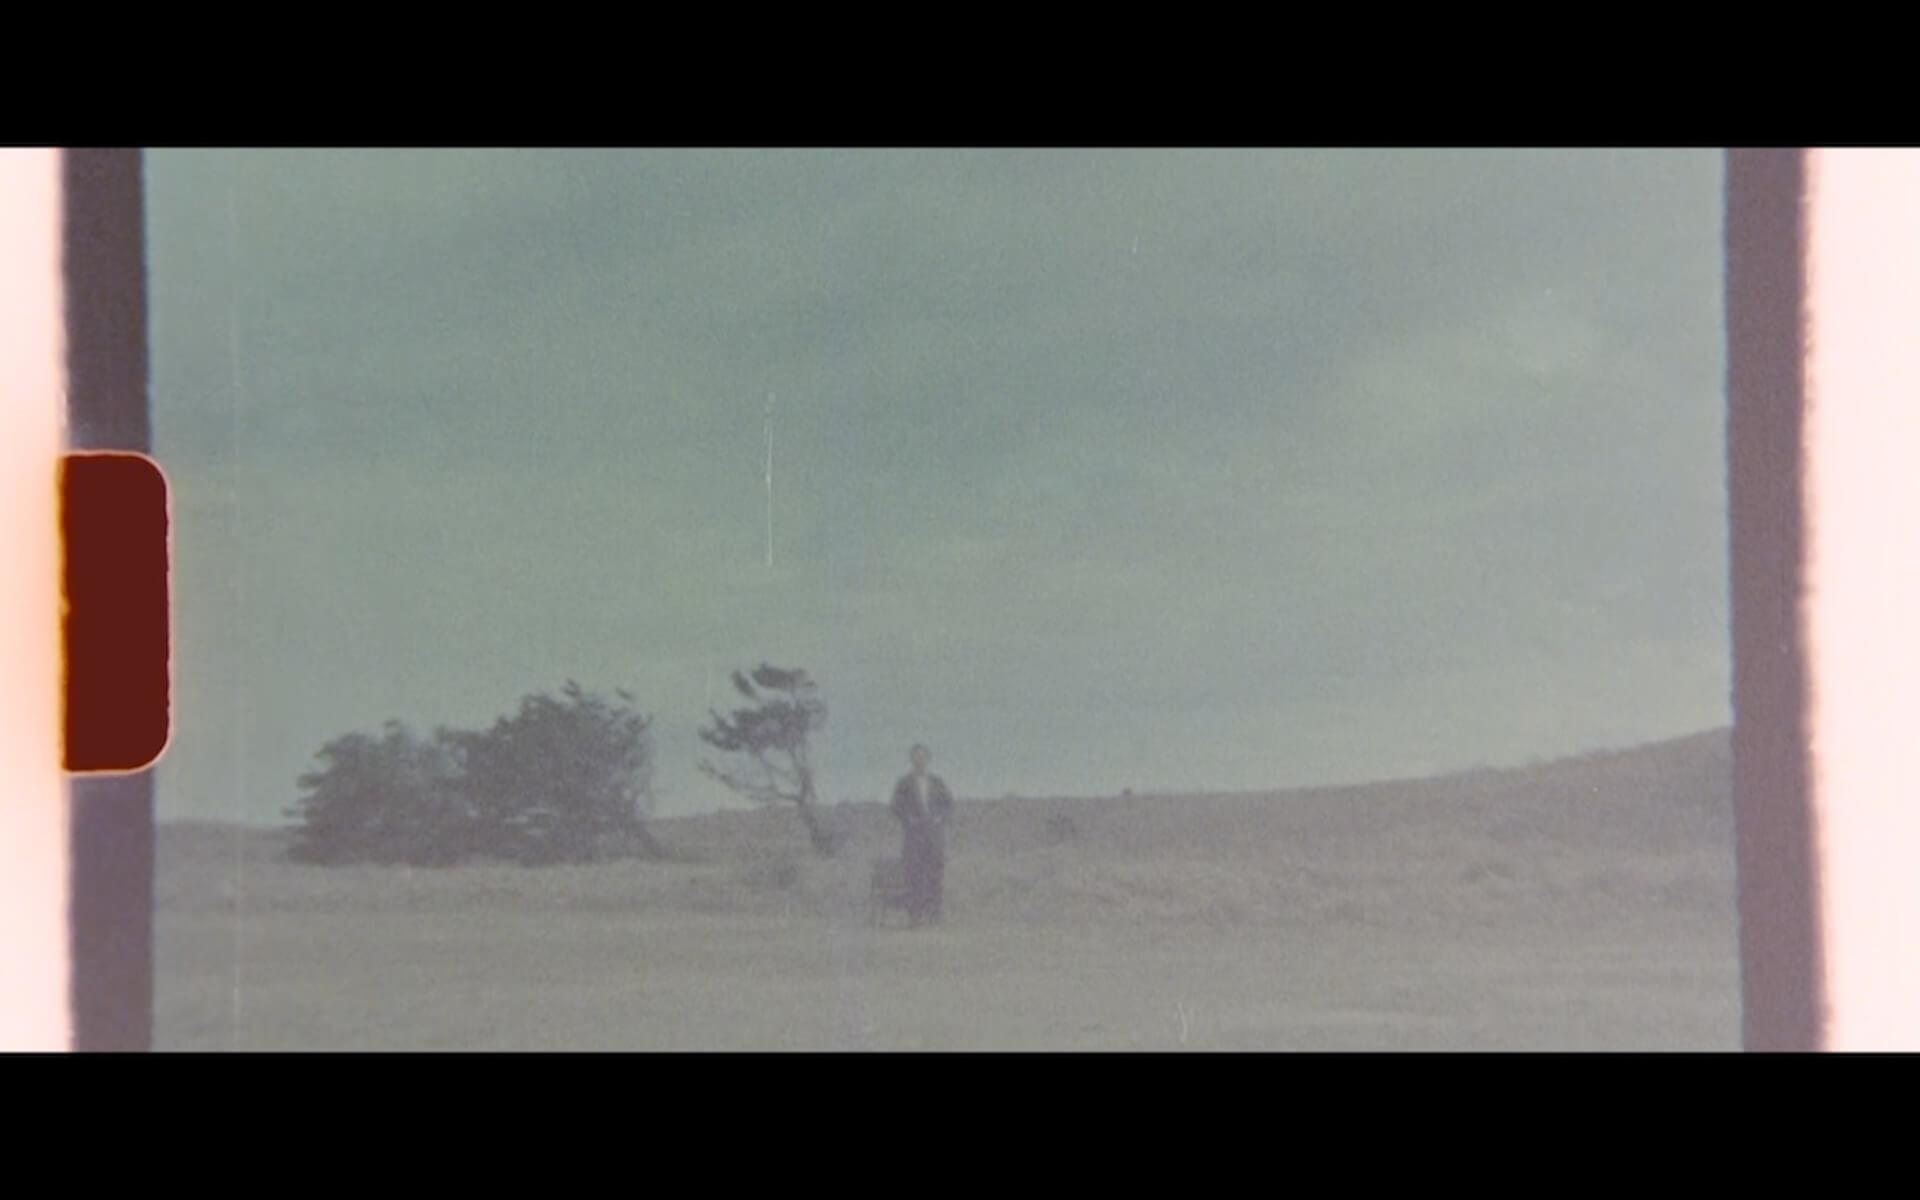 cero髙城晶平によるソロプロジェクトShohei Takagi Parallela Botanicaの1stアルバム『Triptych』リリース決定!角銅真実が帯同するツアーも music200218_cero_takagi_3